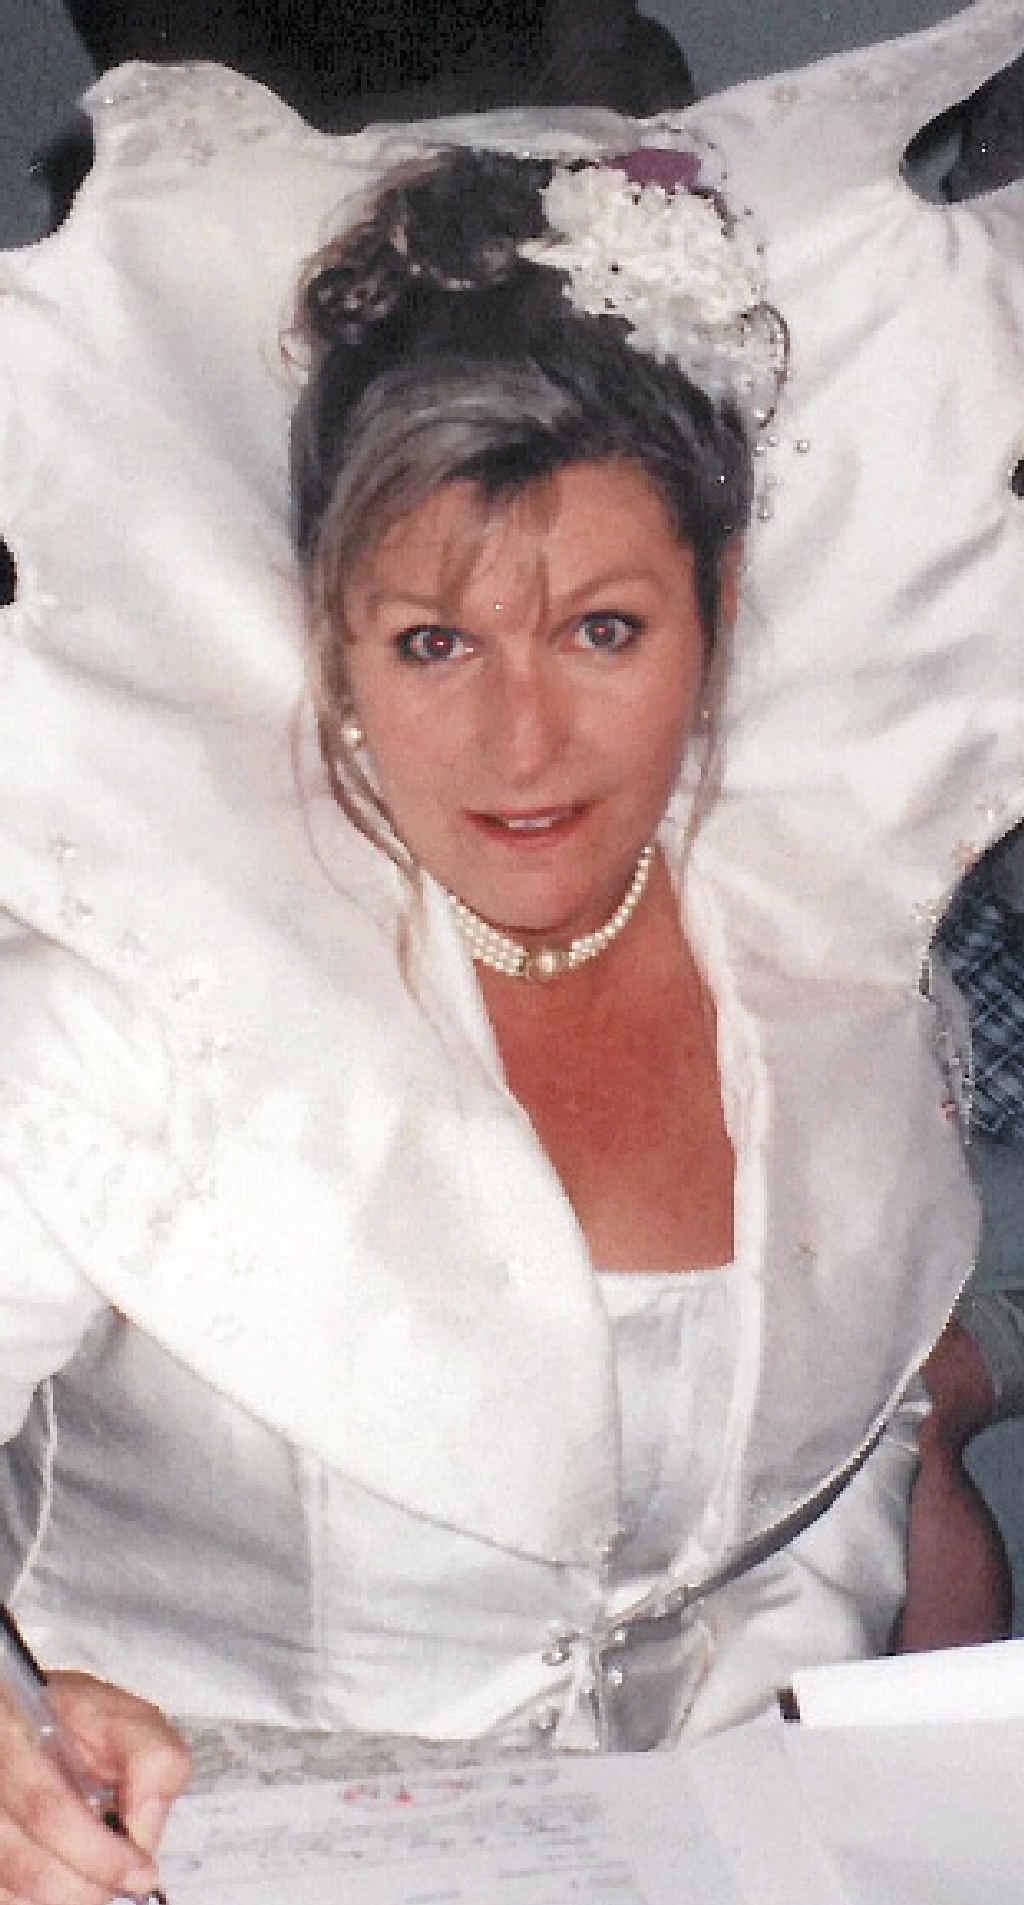 REMEMBERED: Phyllis Morrison-Gardiner in her Barbie-inspired wedding dress in January 2000.